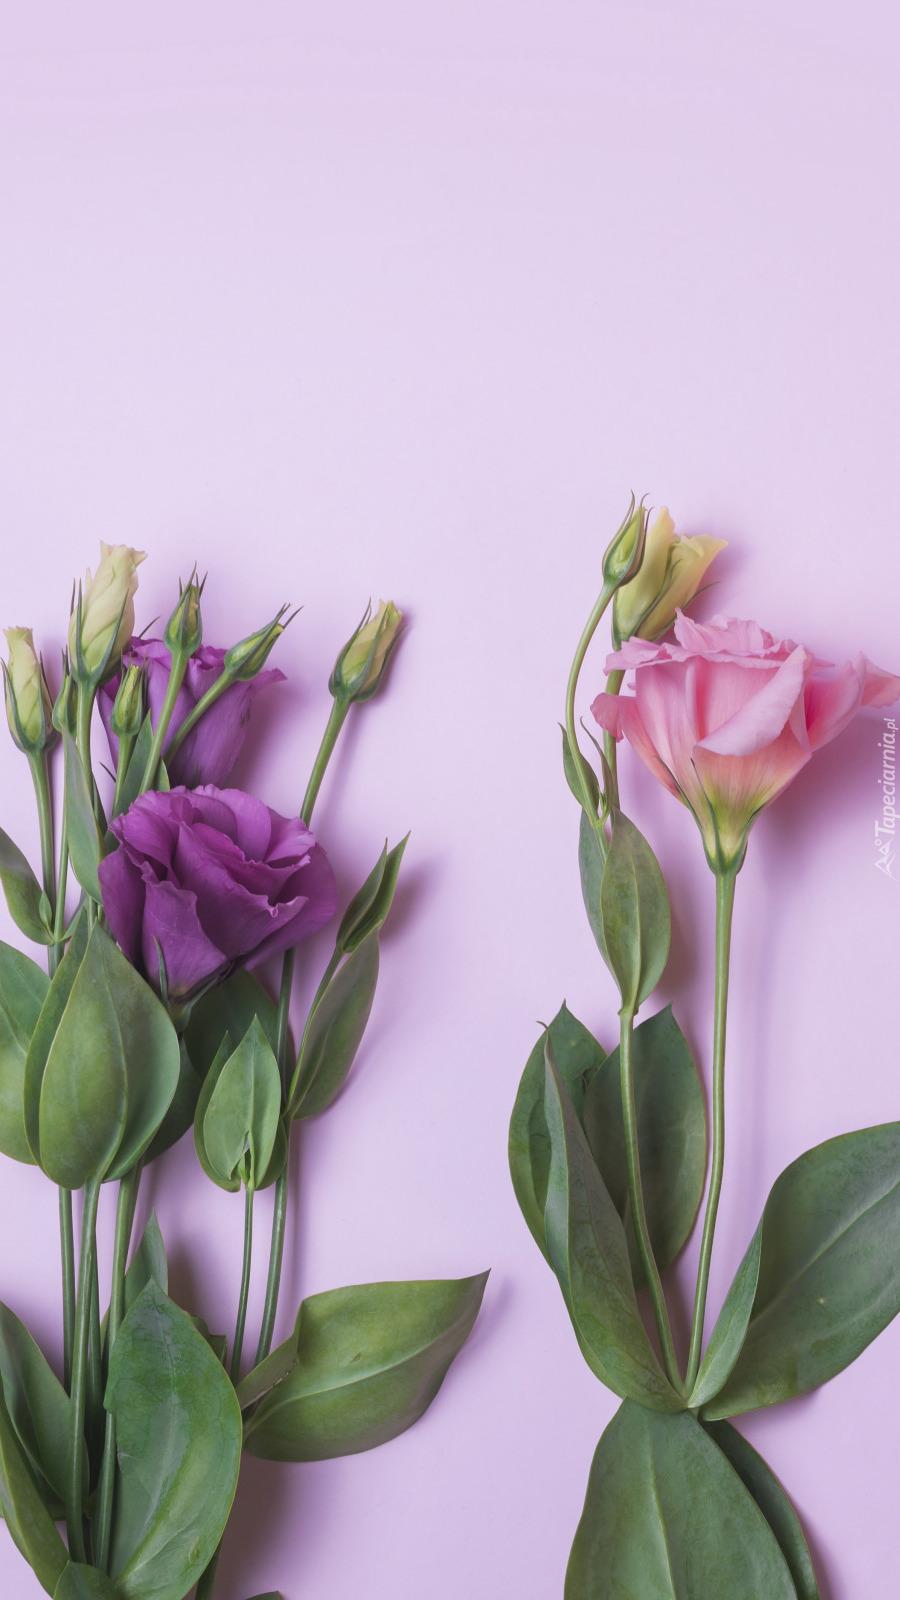 Różowa i fioletowa eustoma